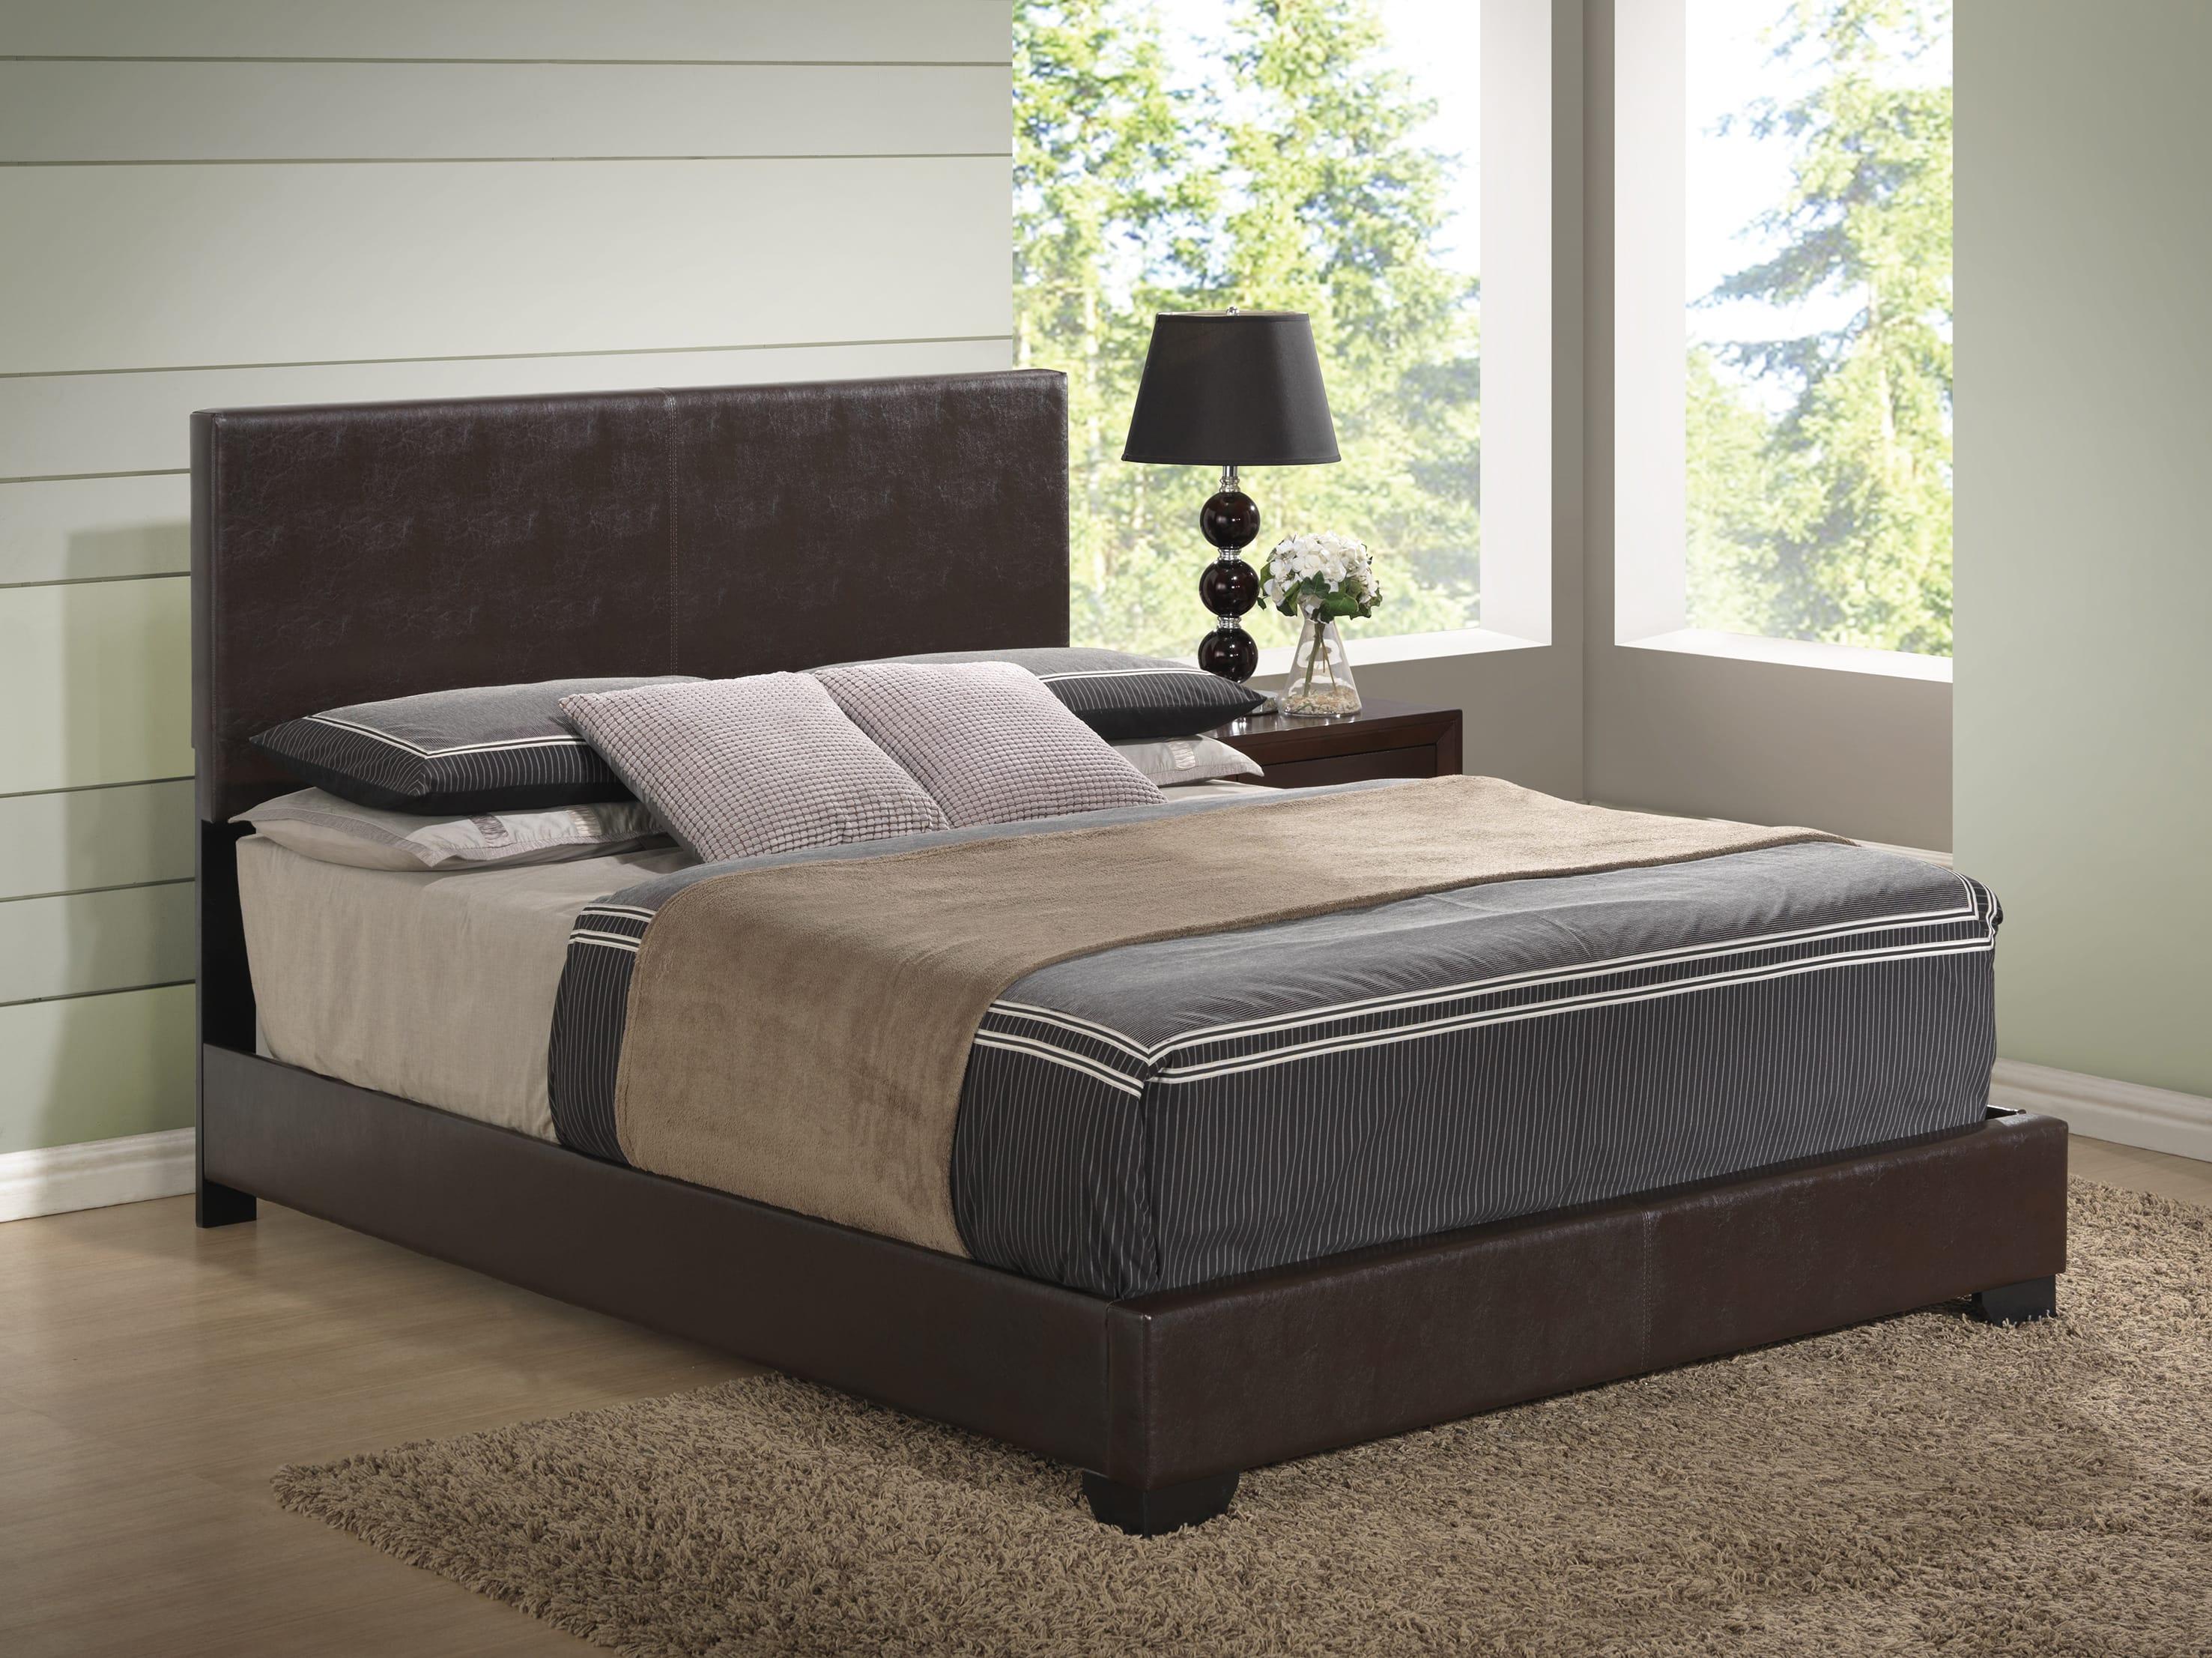 Rosa Antique Black Bedroom Set W 8103 Brown Pu Bed By Global Furniture